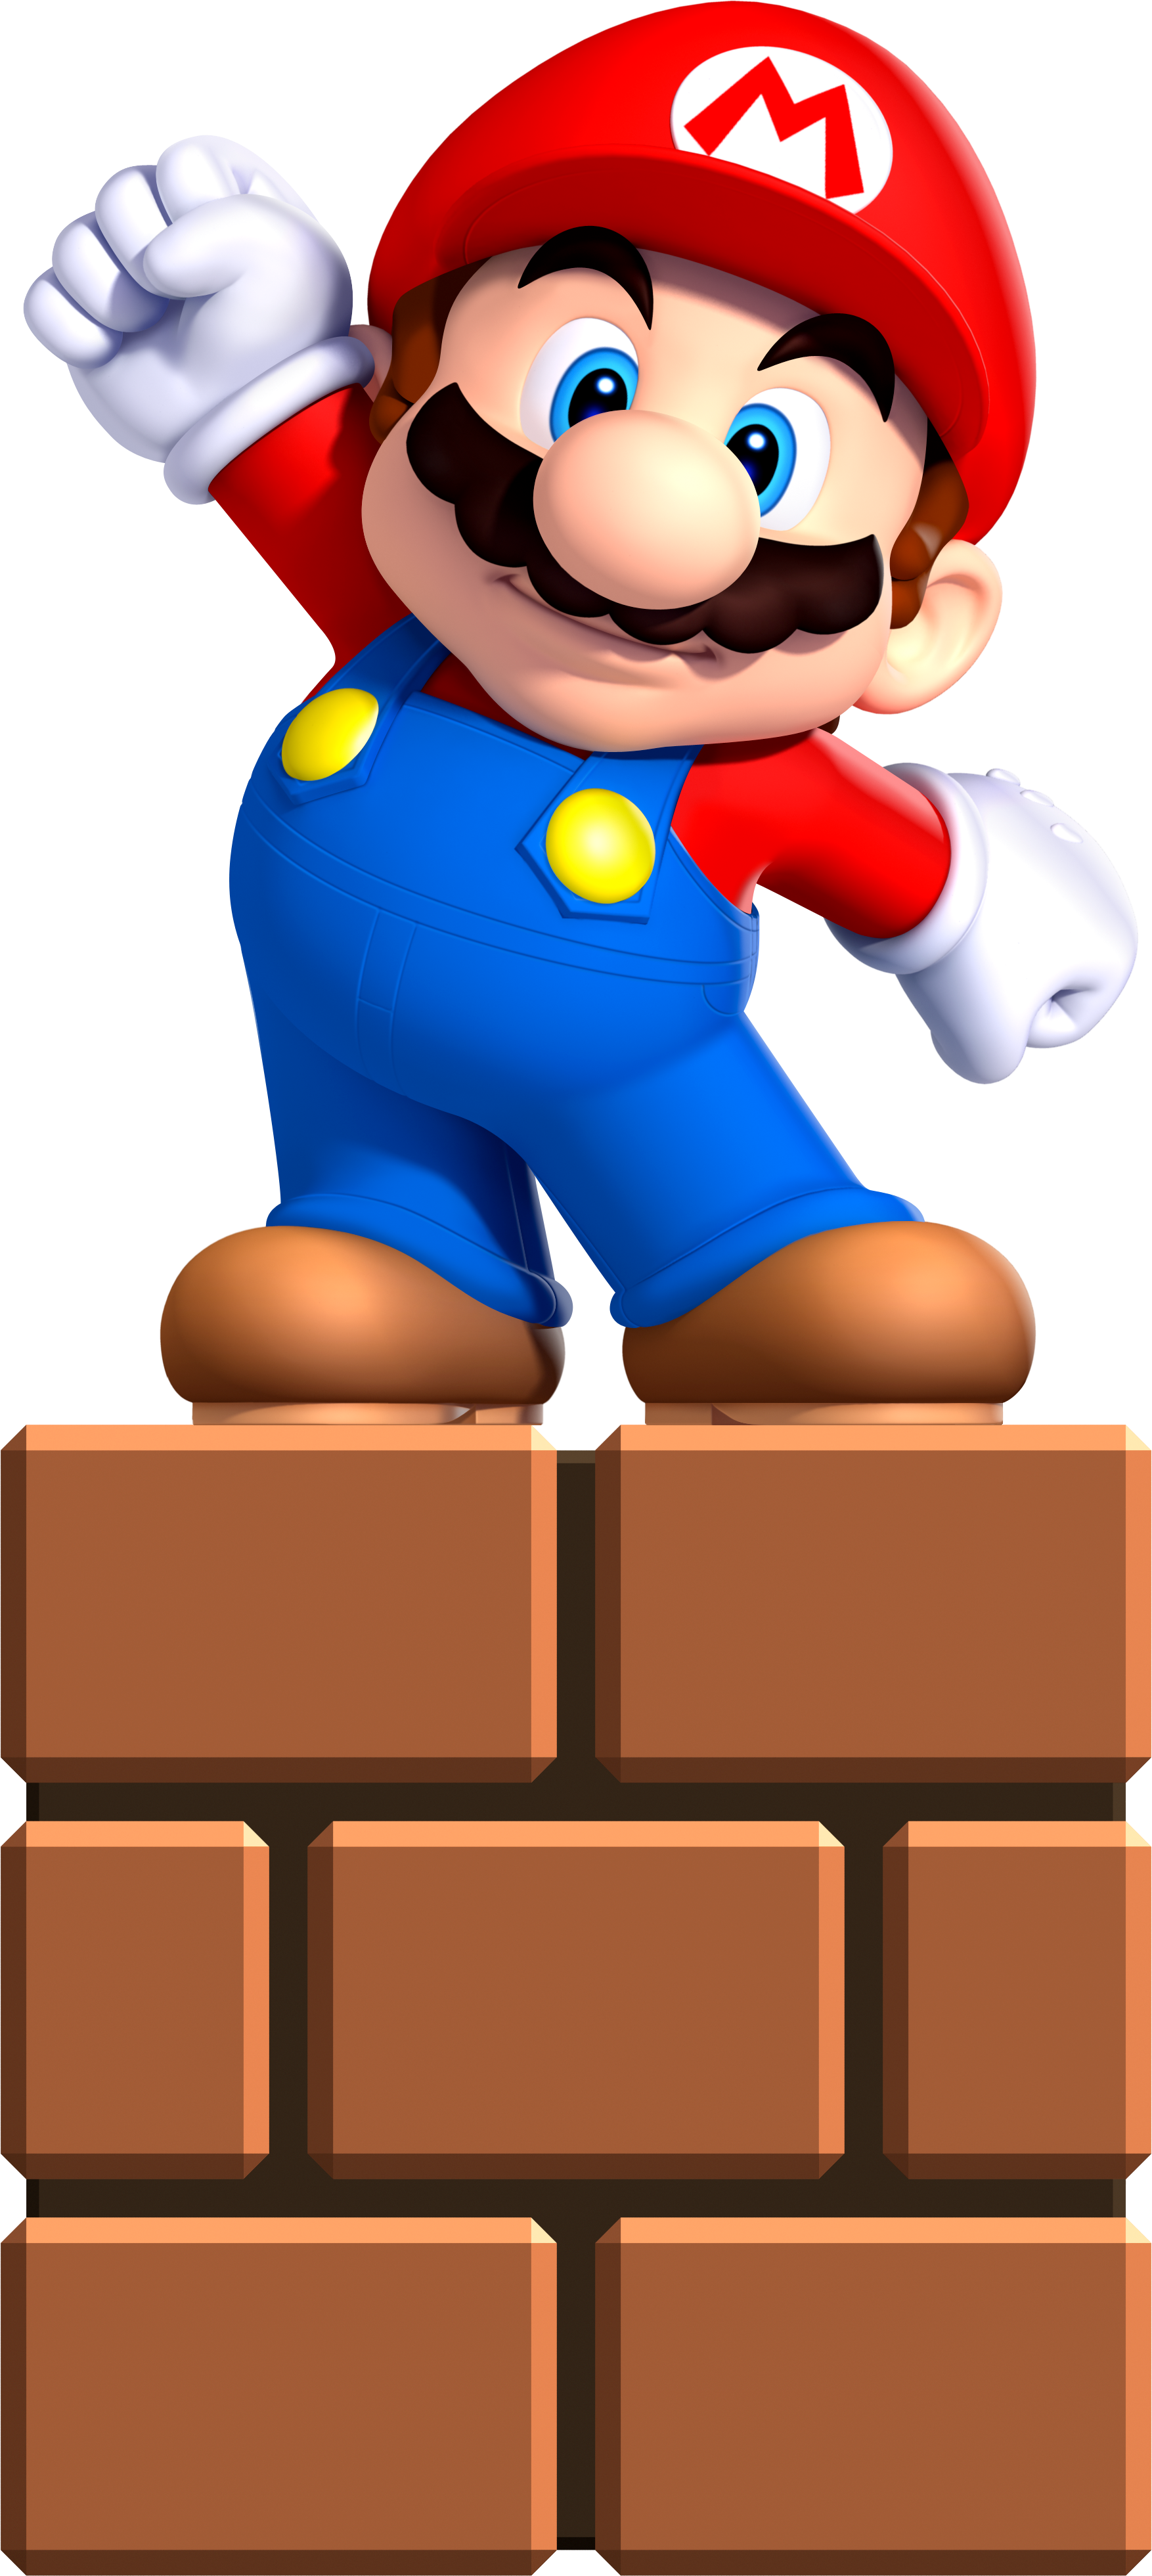 Mario Running Png Image Super Mario Bros Super Mario Super Mario Brothers